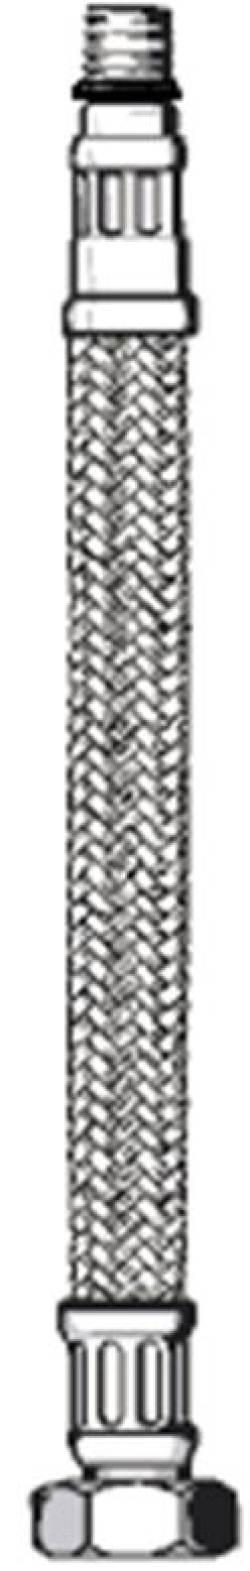 МЕ 5615.3210.35 Meiflex Dn8, М10x1/2ВP, 350mm